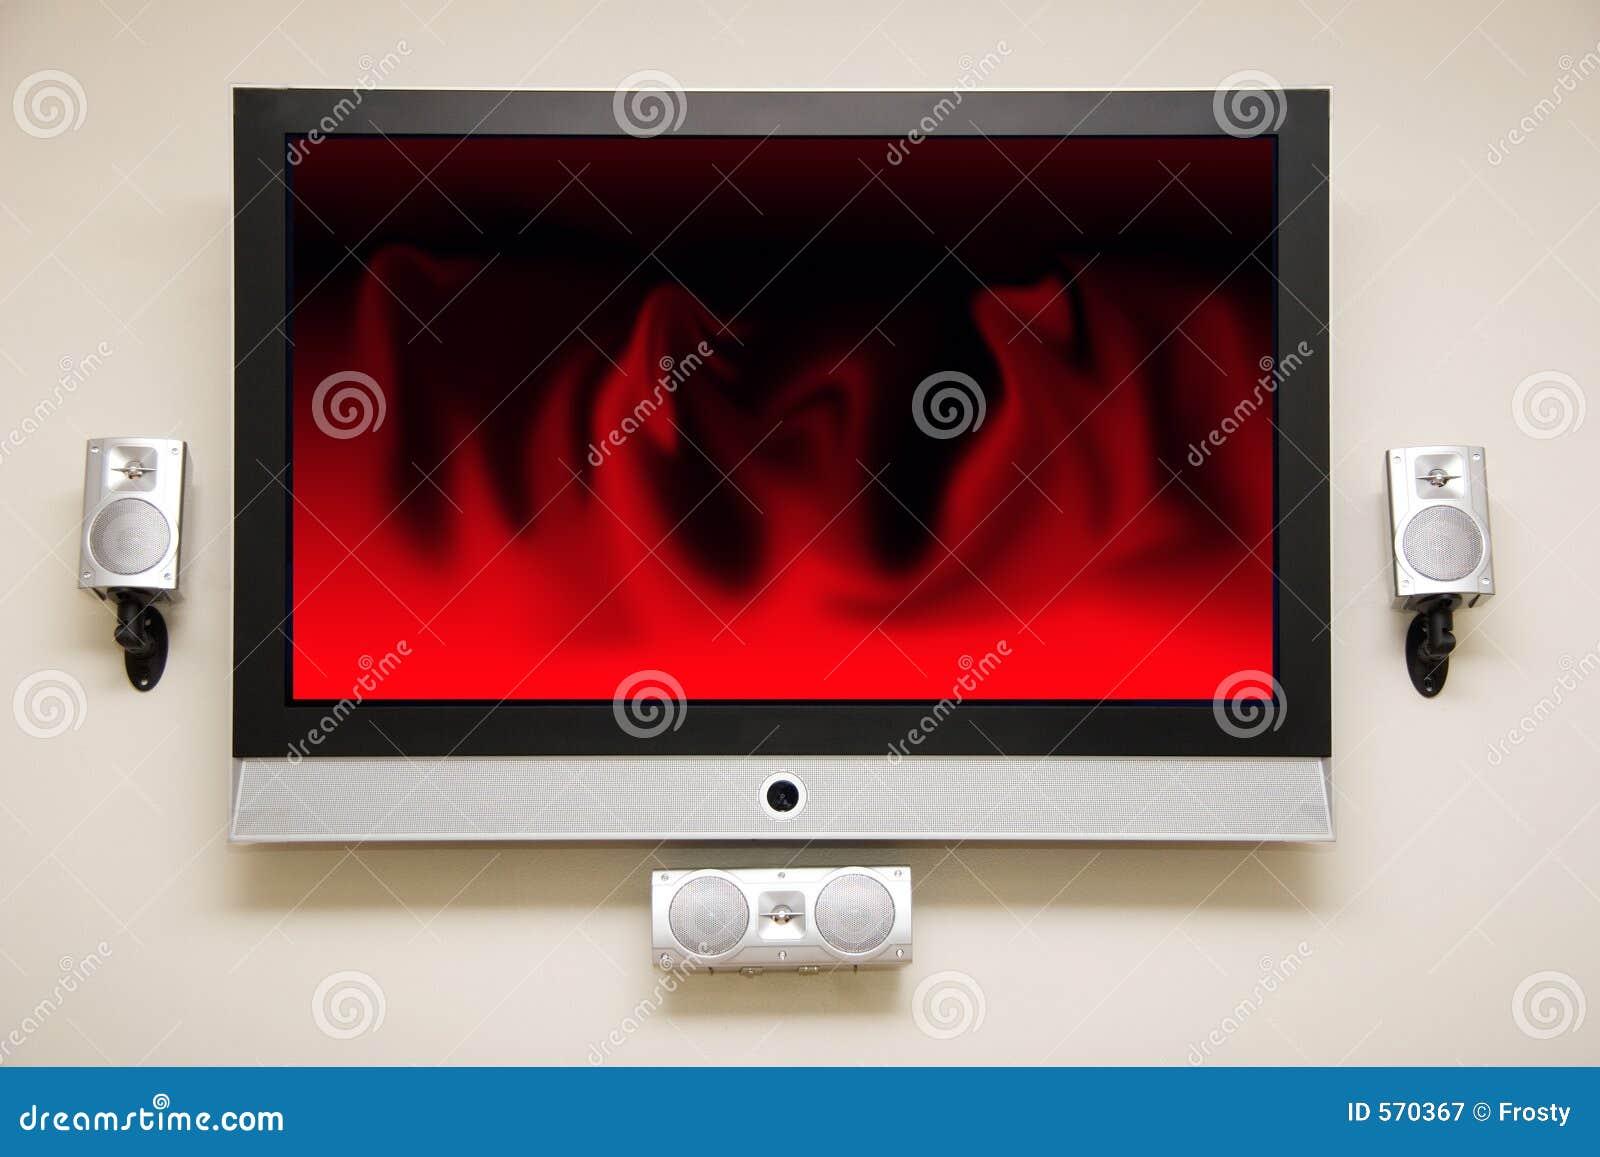 Plasma Widescreen